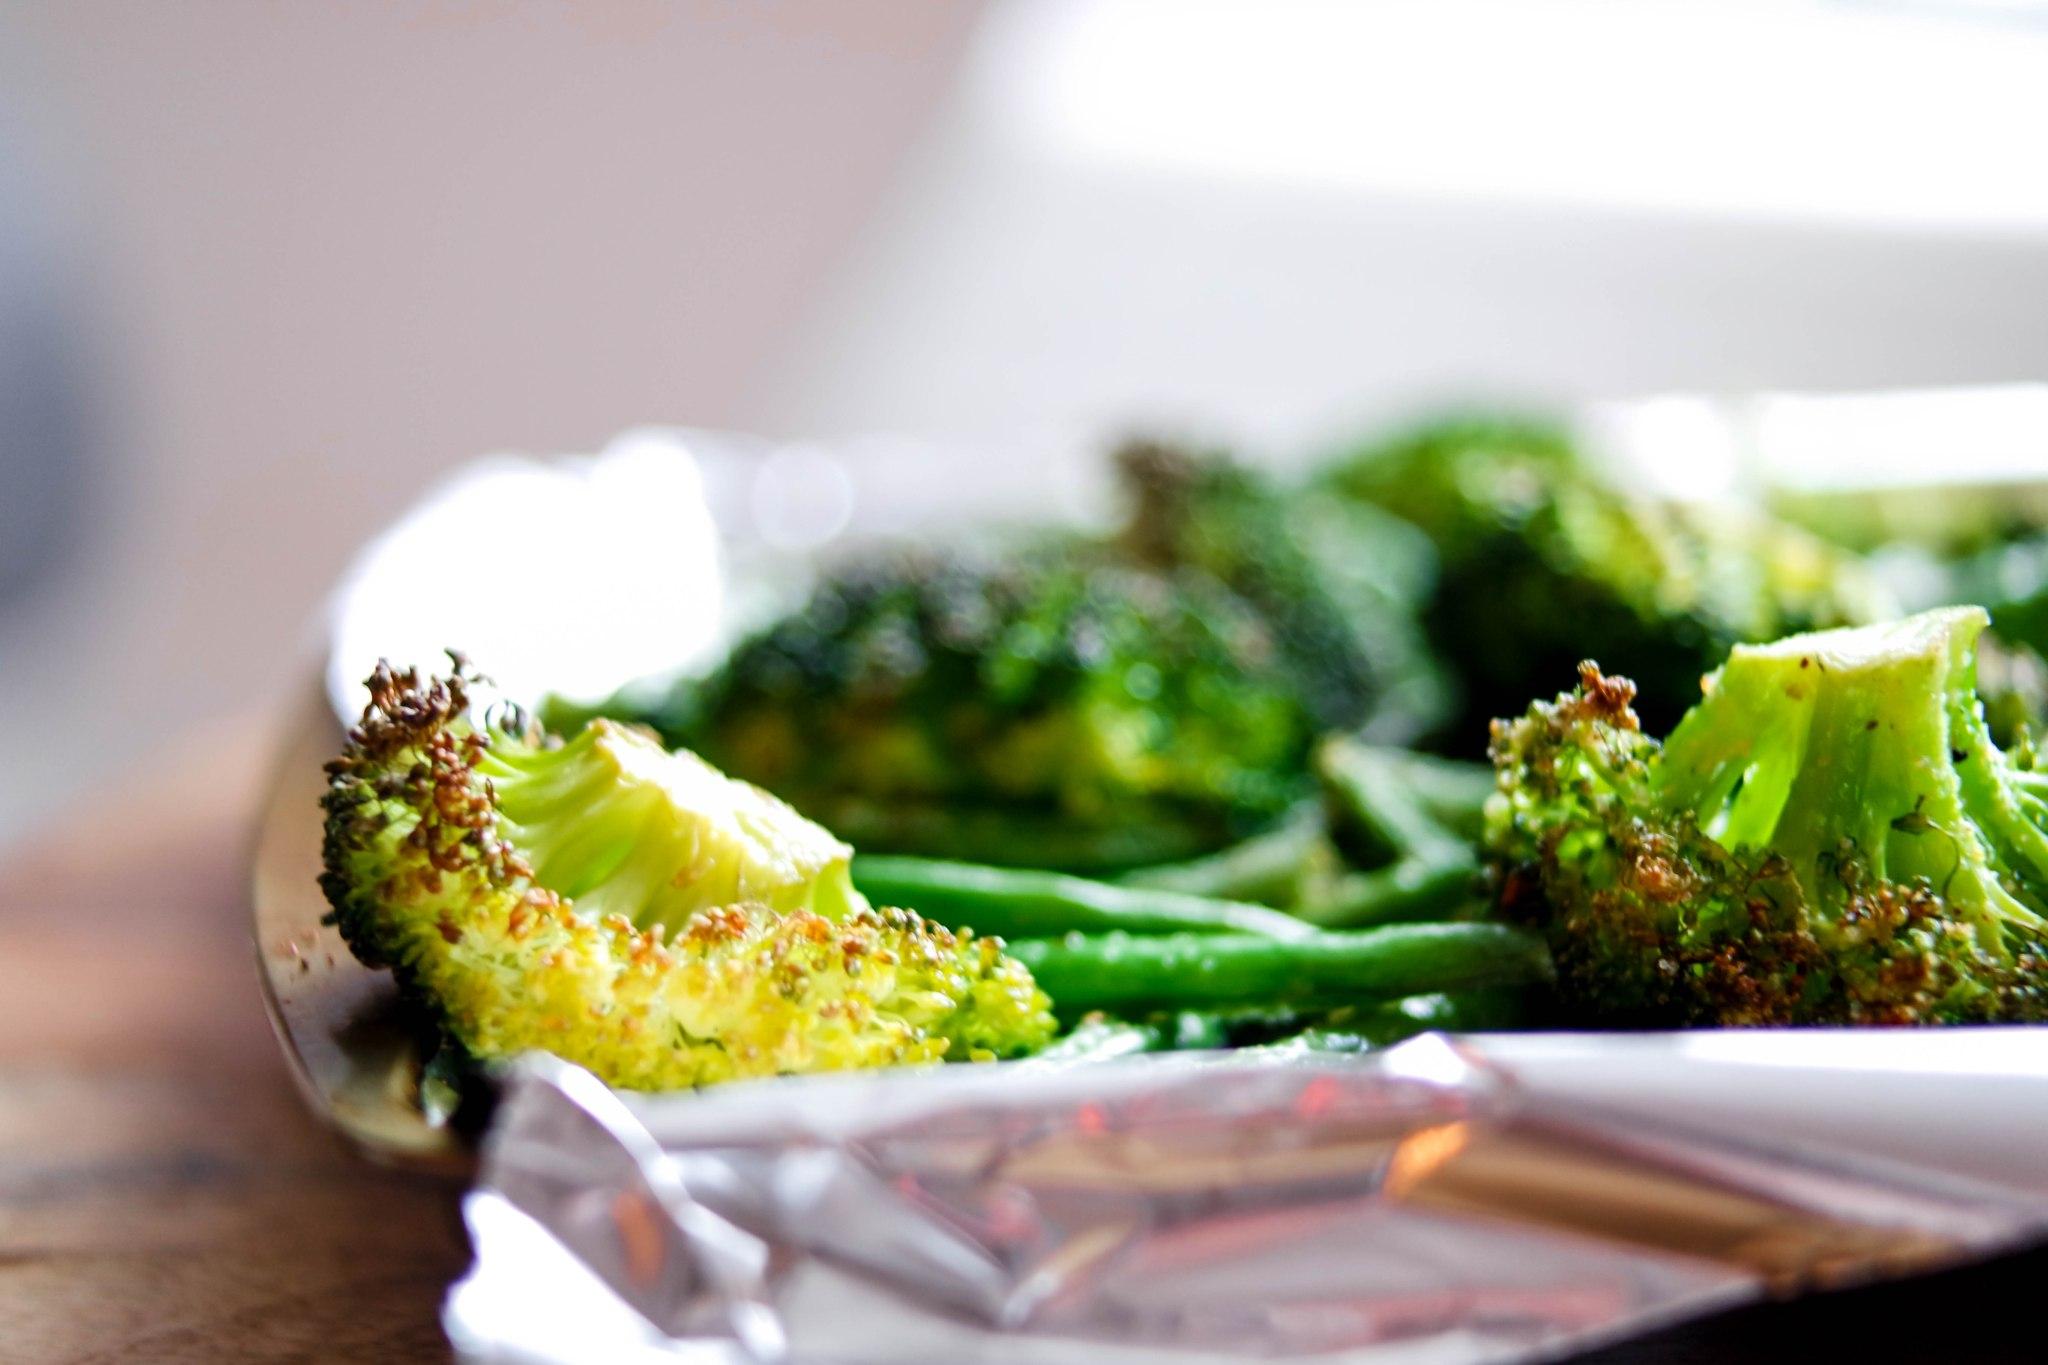 Roasted Broccoli with Avocado Oil